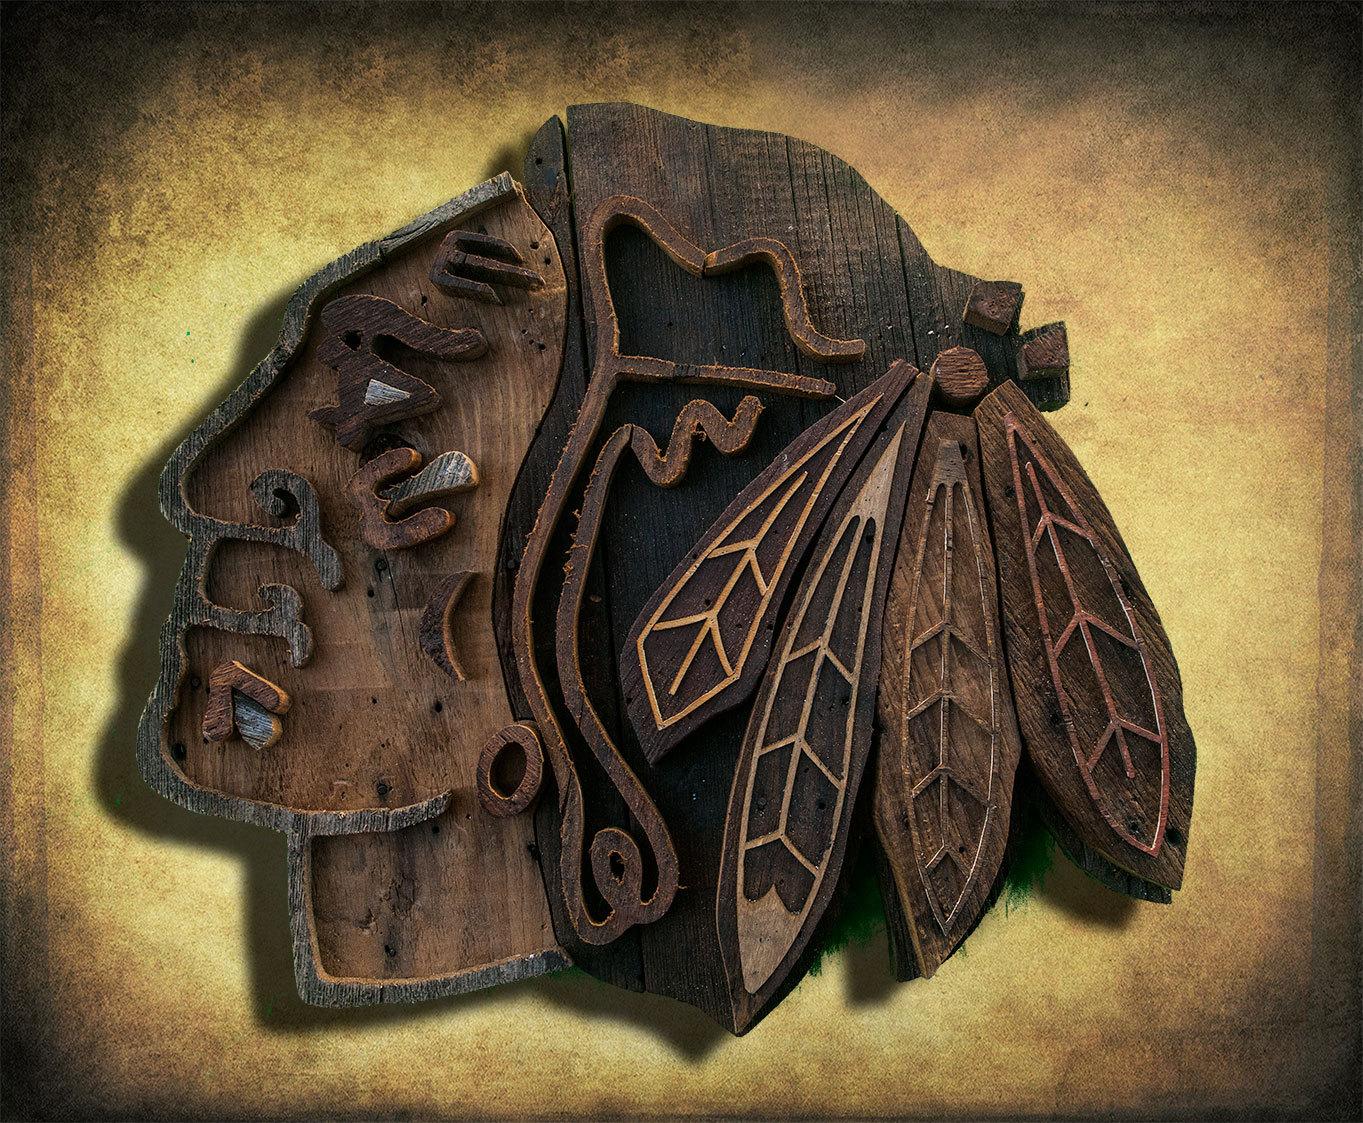 Man Cave Hockey Signs : Hockey fanatic and dream toronto maple leafs man cave u